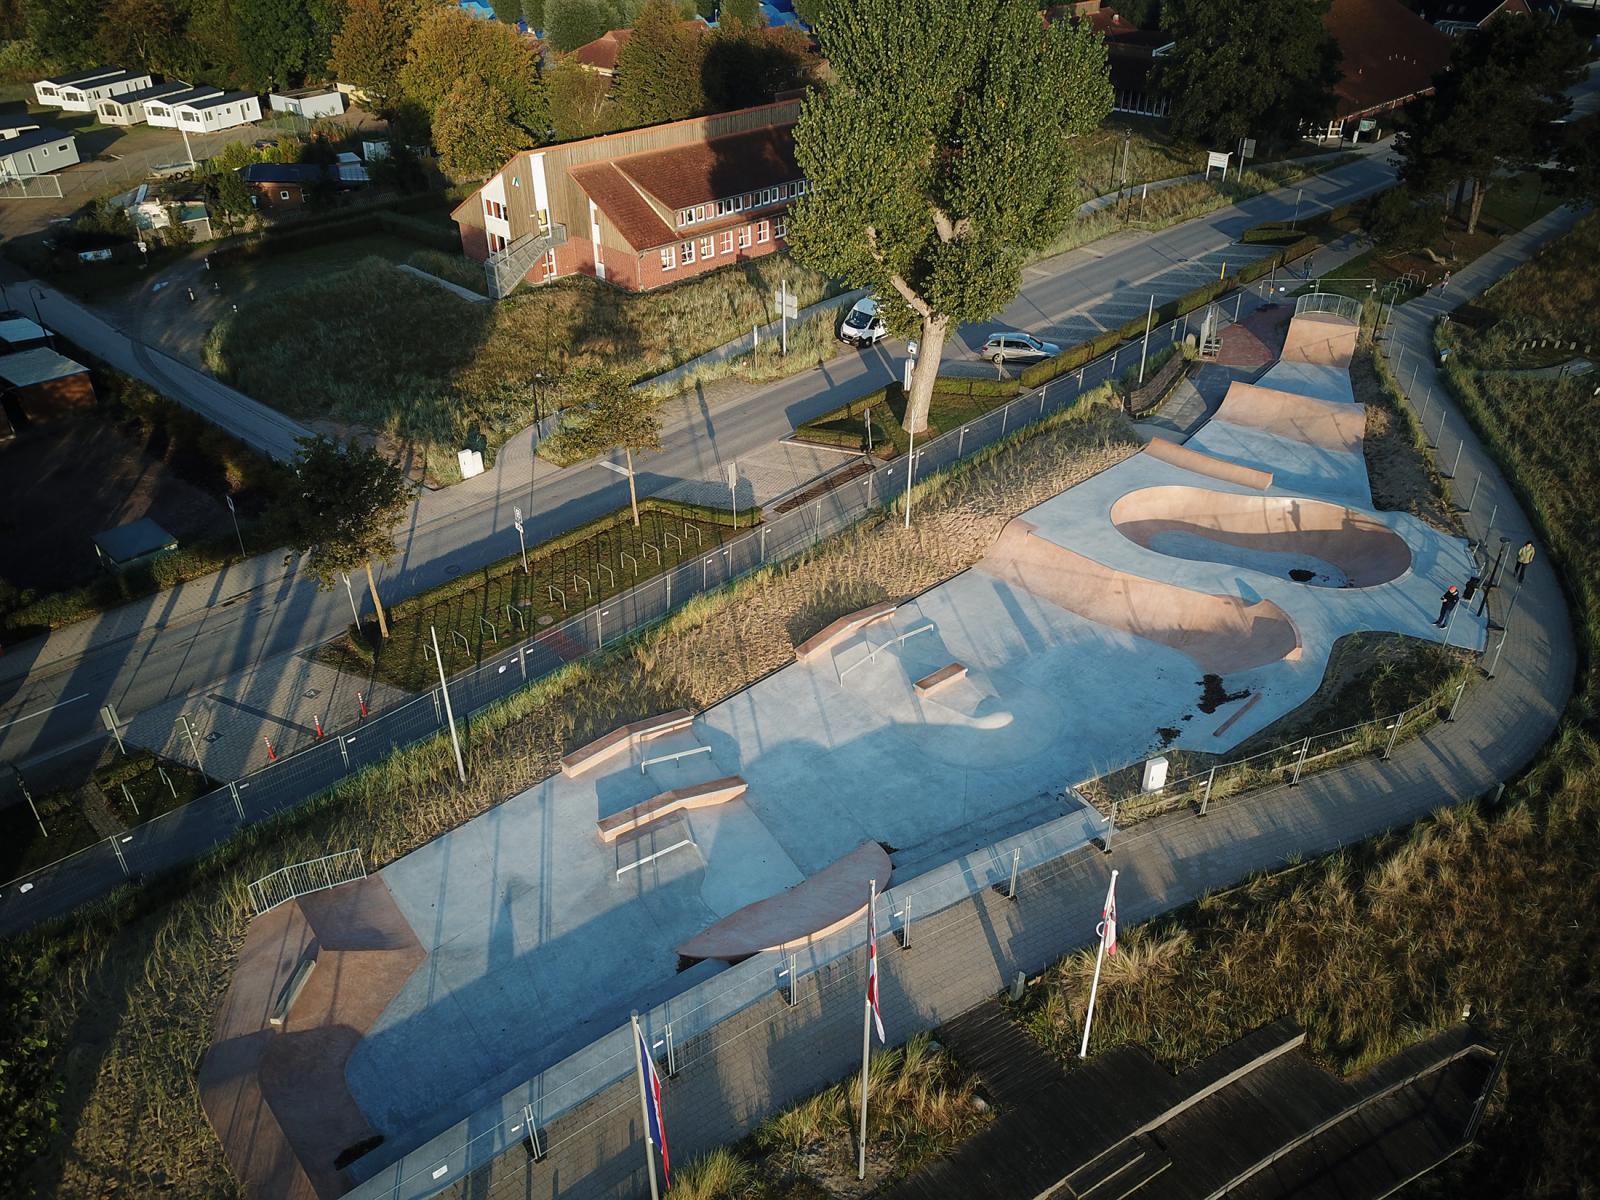 ML_Skatepark_Scharbeutz_08